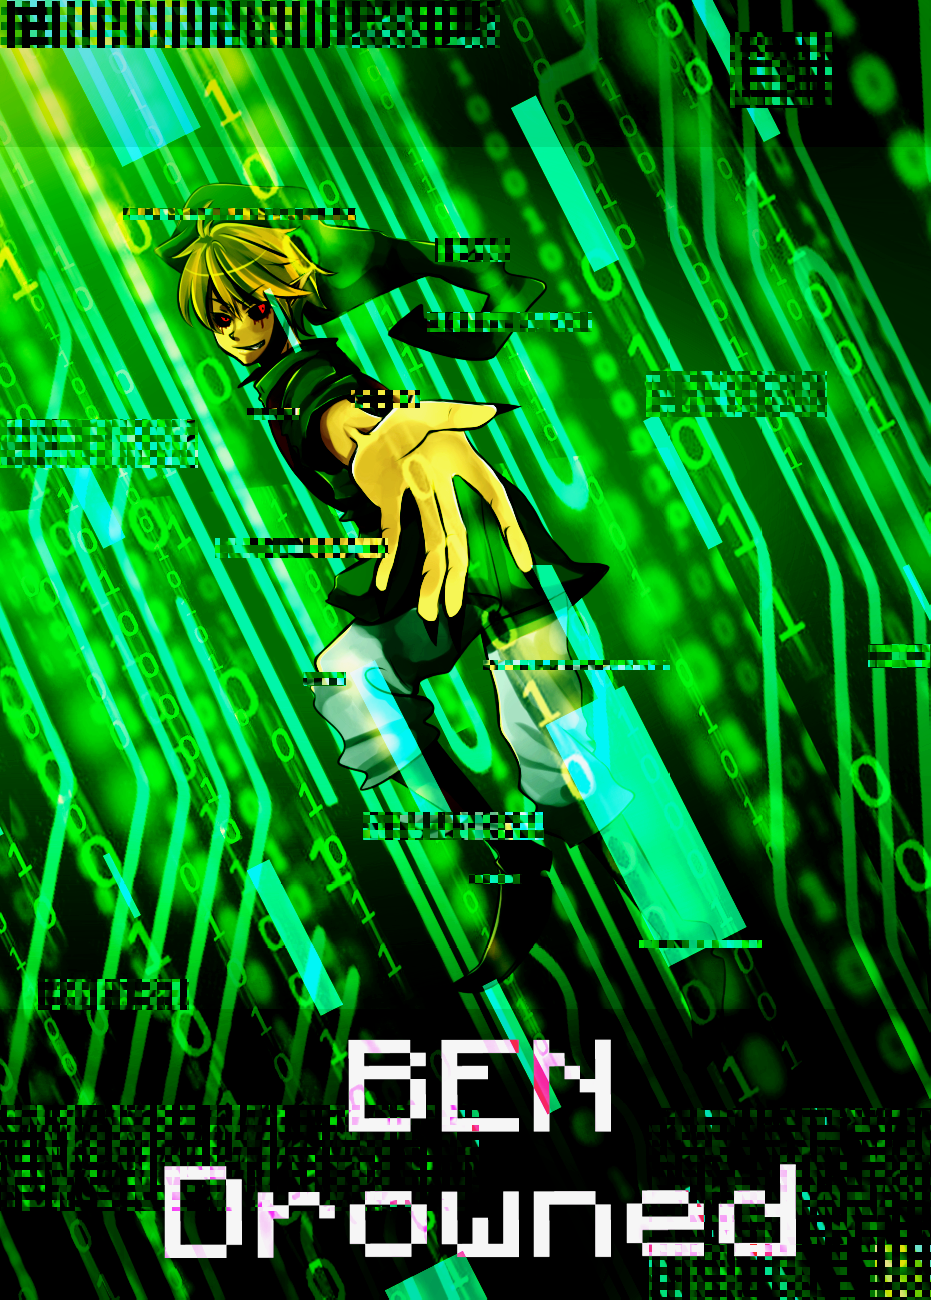 -A Glitchy Cyber Journey- by Ari-chii19